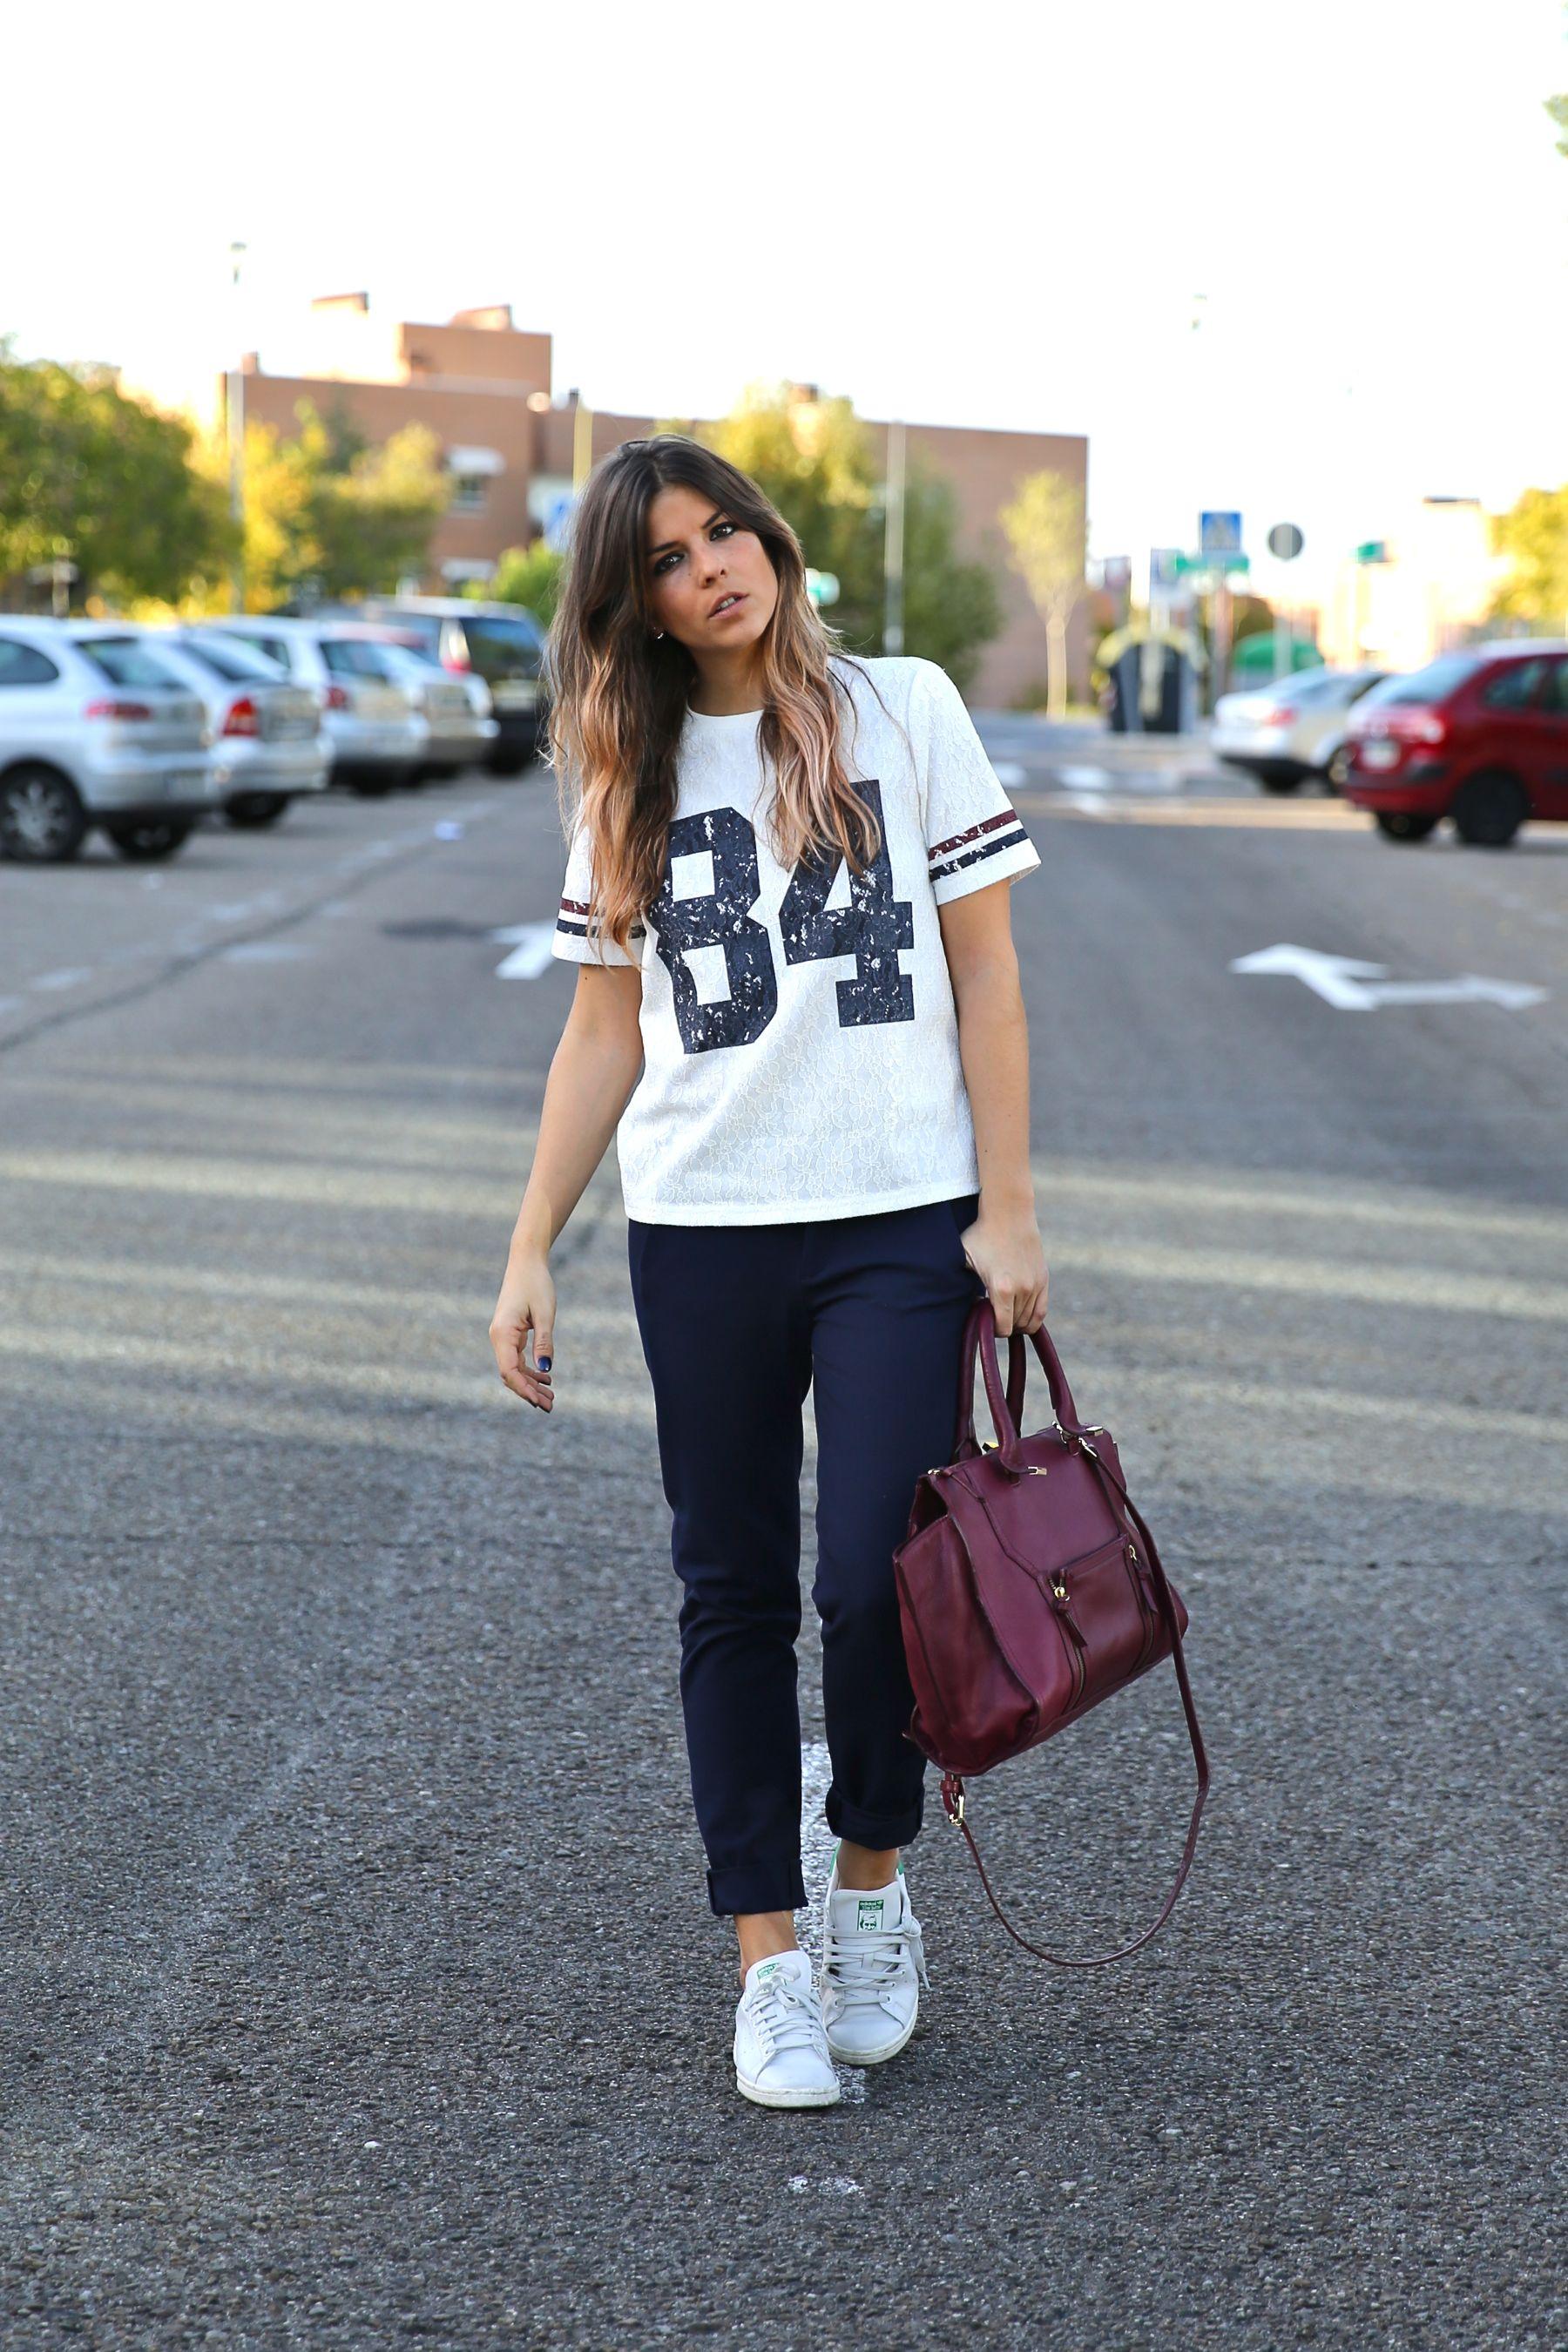 trendy_taste-look-outfit-street_style-ootd-blog-blogger-fashion_spain-moda_españa-zara-stan_smith-adidas-cosette-tee-baseball-camiseta-numero-pantalón-capri-pinzas-1